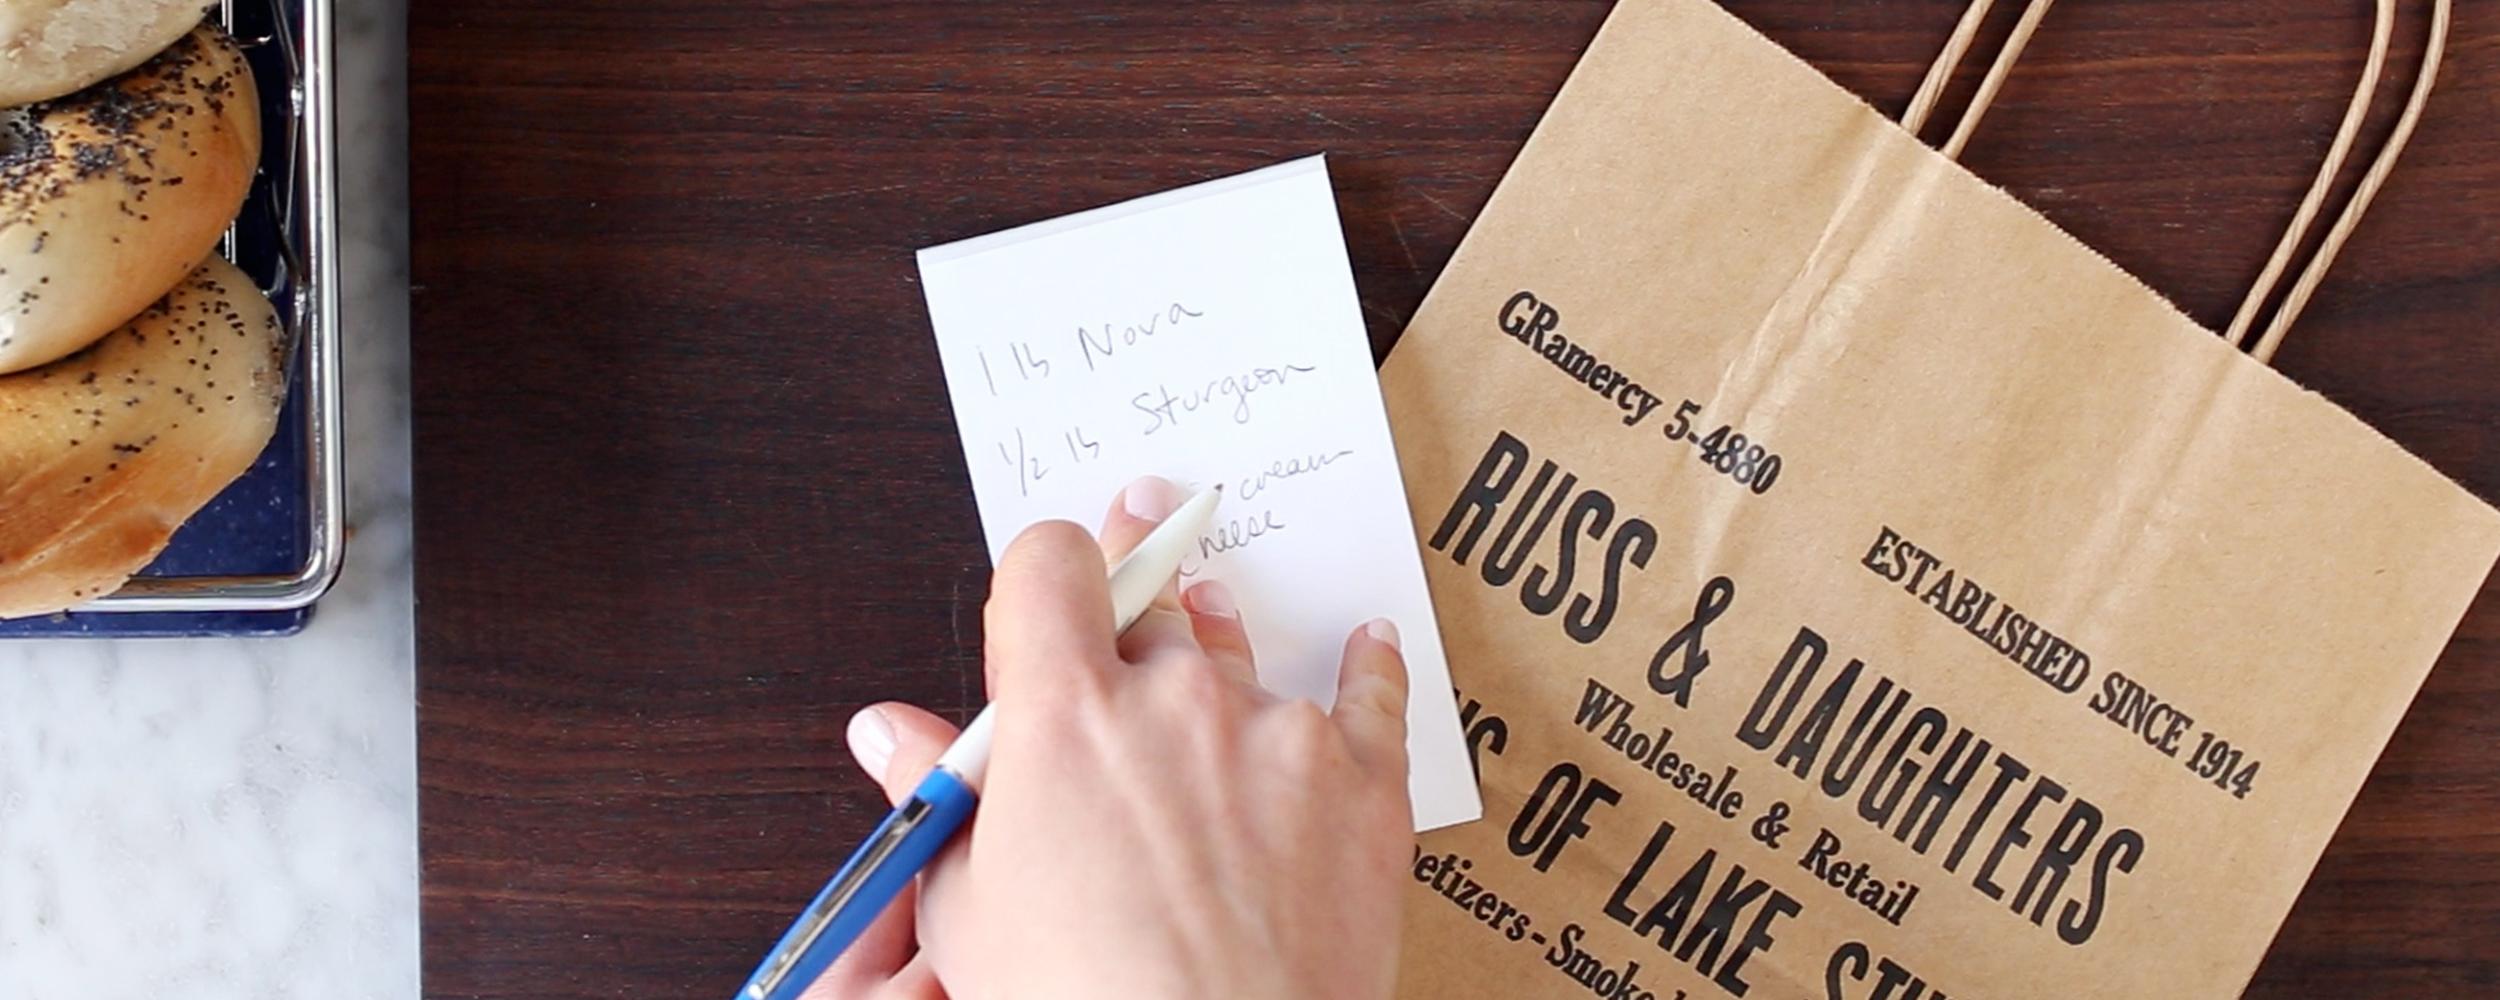 shop-home-image-handwritten-ticket.jpg